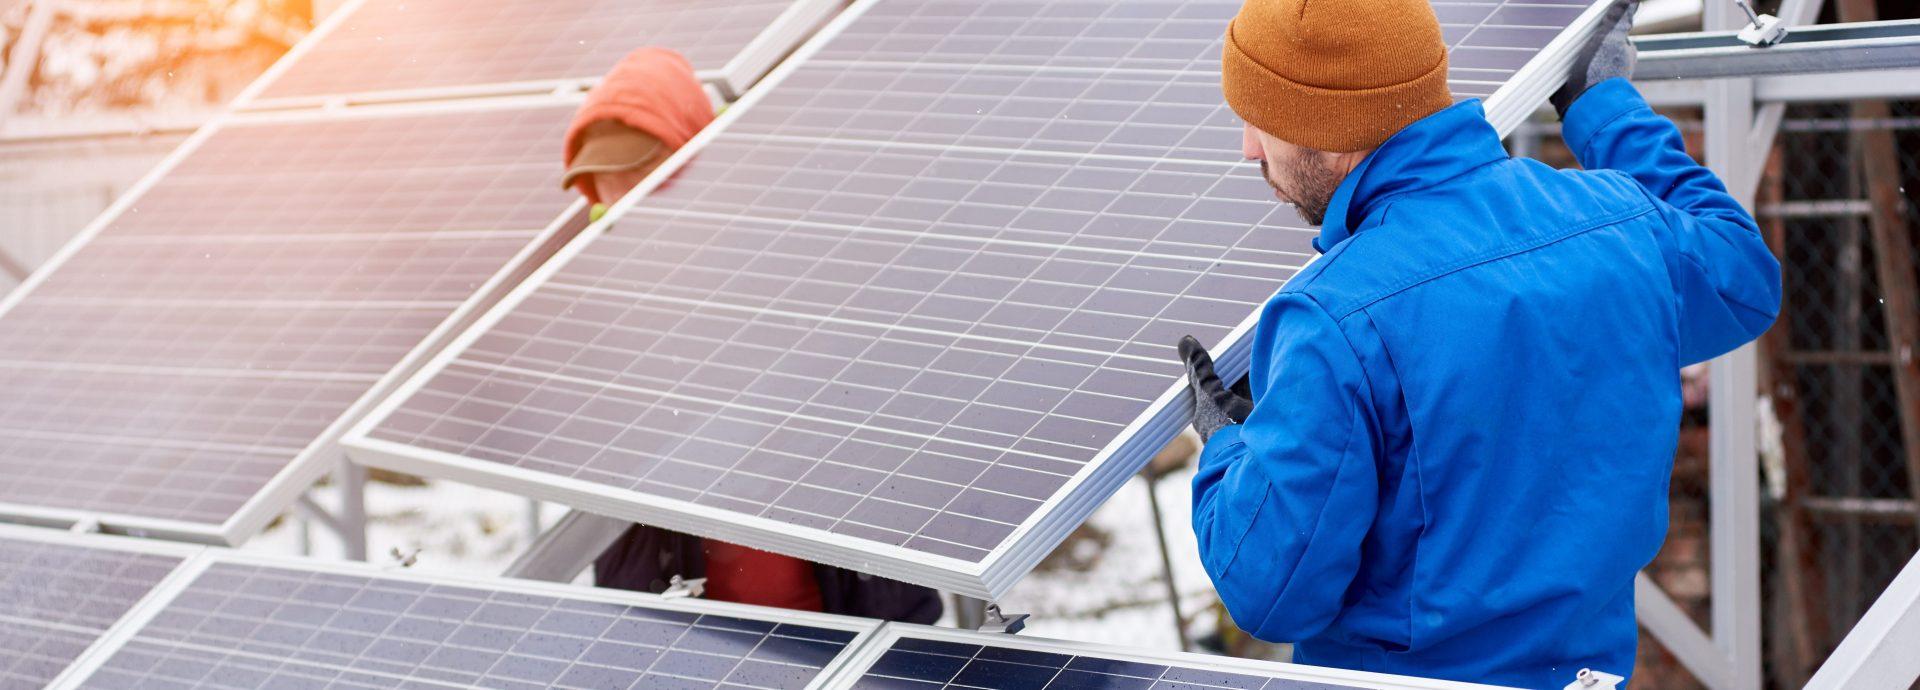 A solar panel installation company serving Pennsylvania and Maryland.